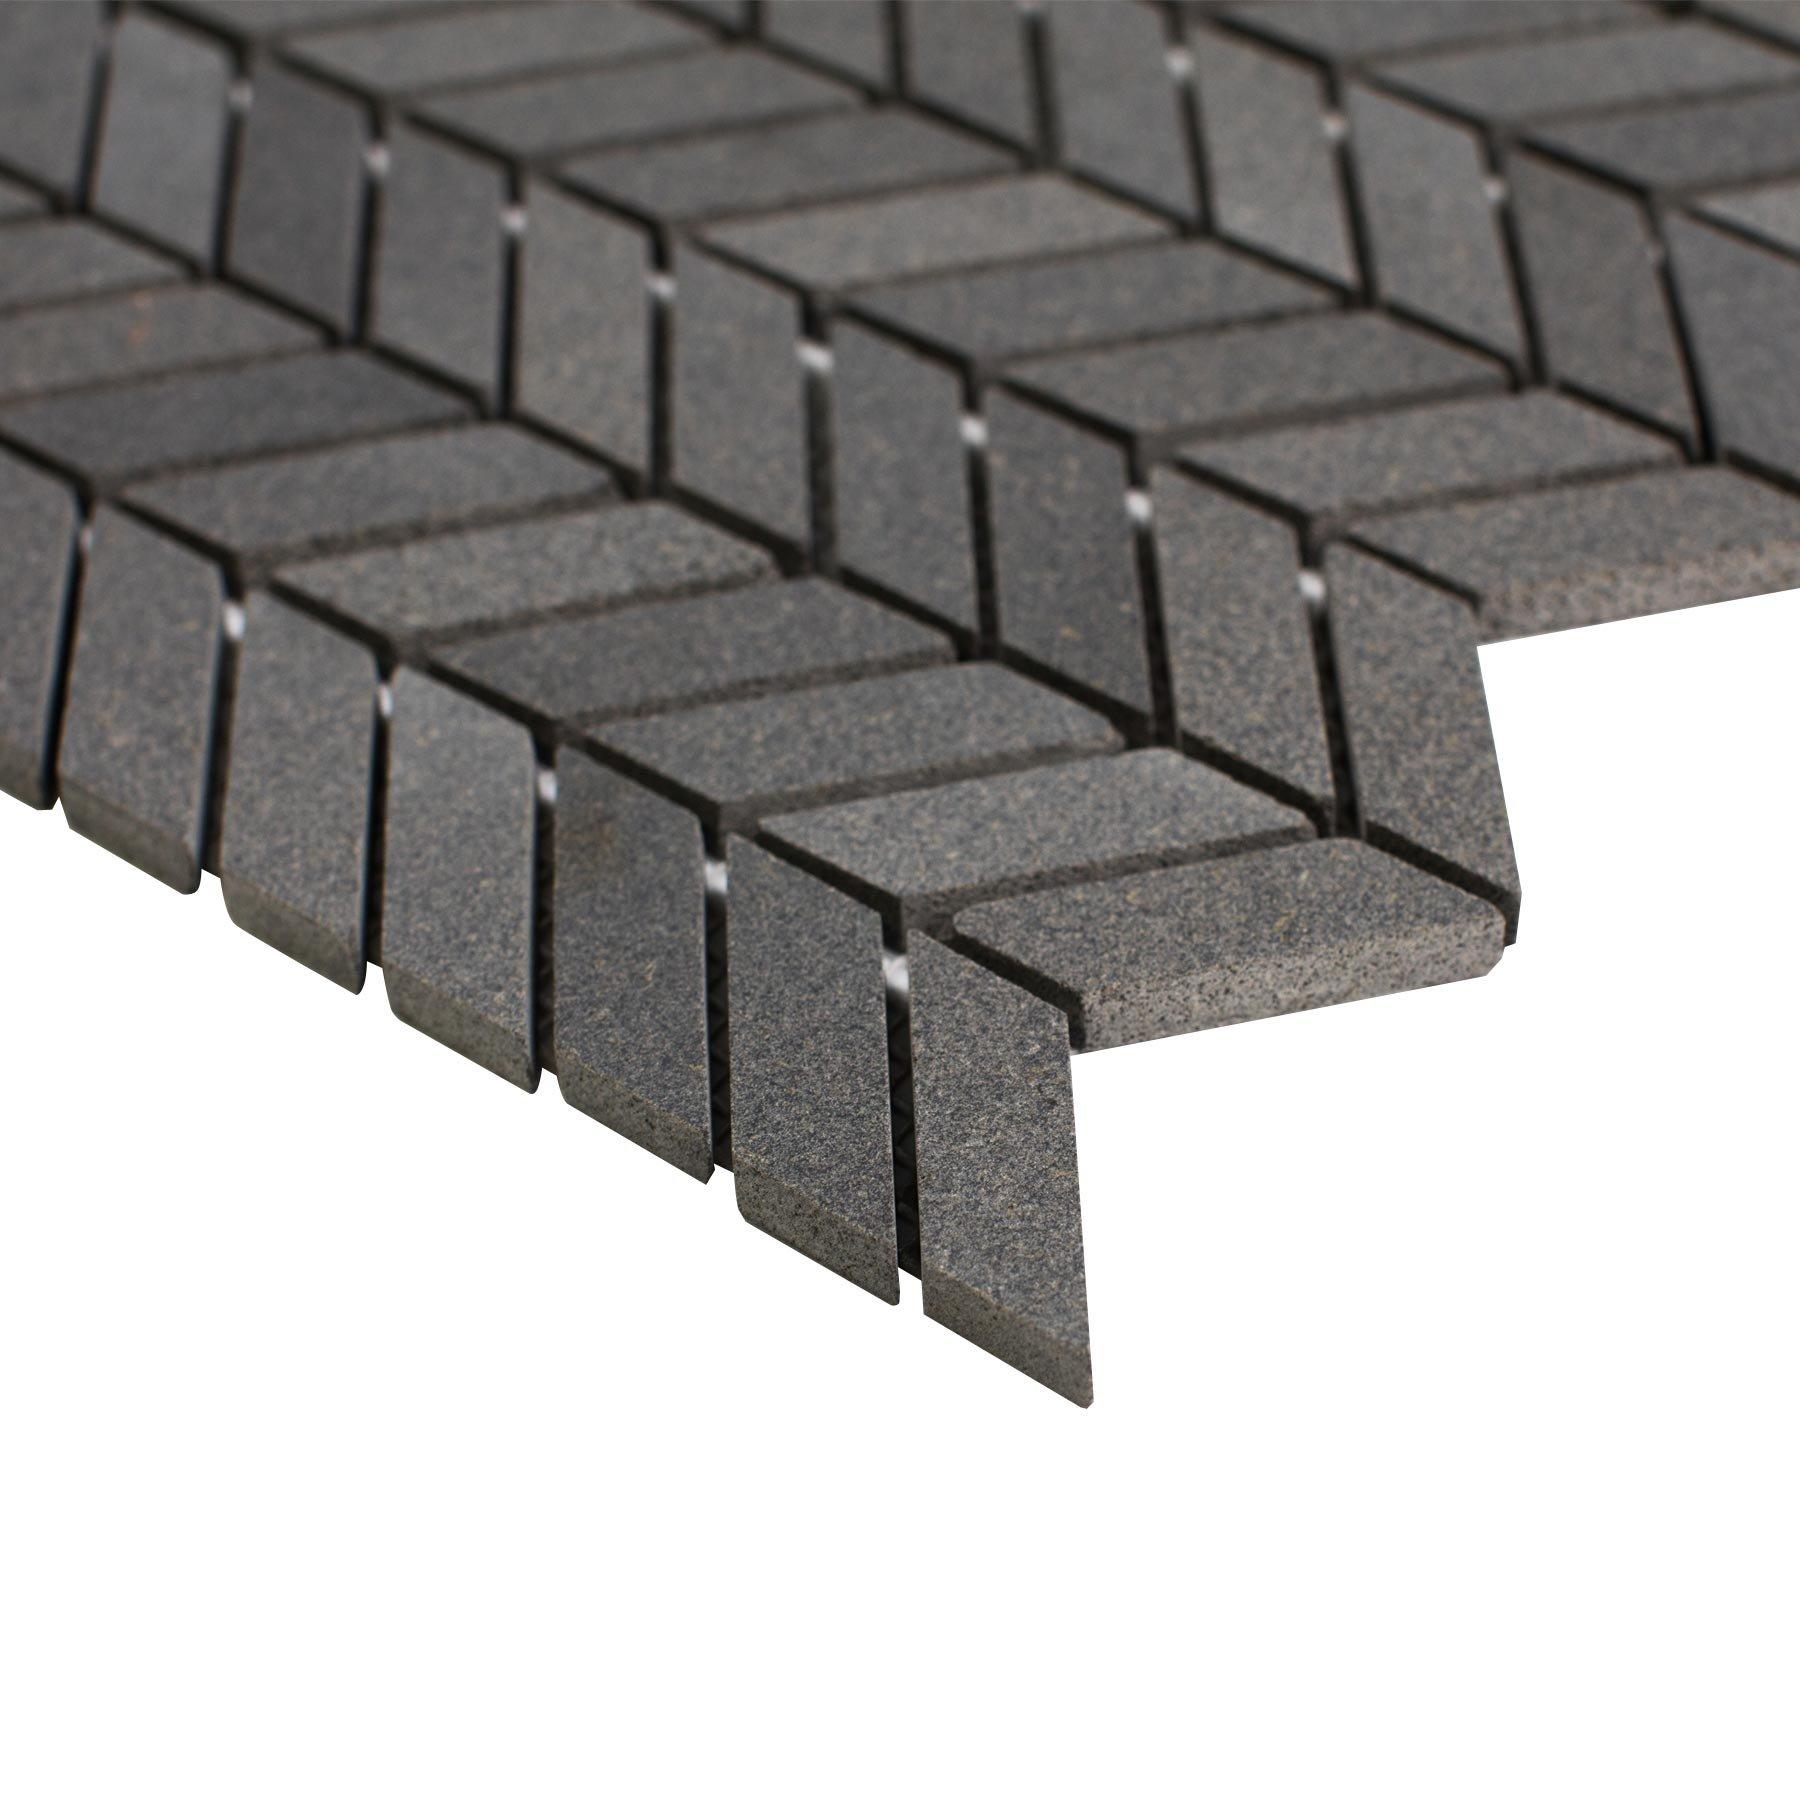 Maykke 12'' x 11'' Holden Chevron Mosaic Wall and Floor Tile | Backsplash for Kitchen, Bathroom, or Laundry Room | 9 Sq Ft Basalt (10-Pack), YOA1000101